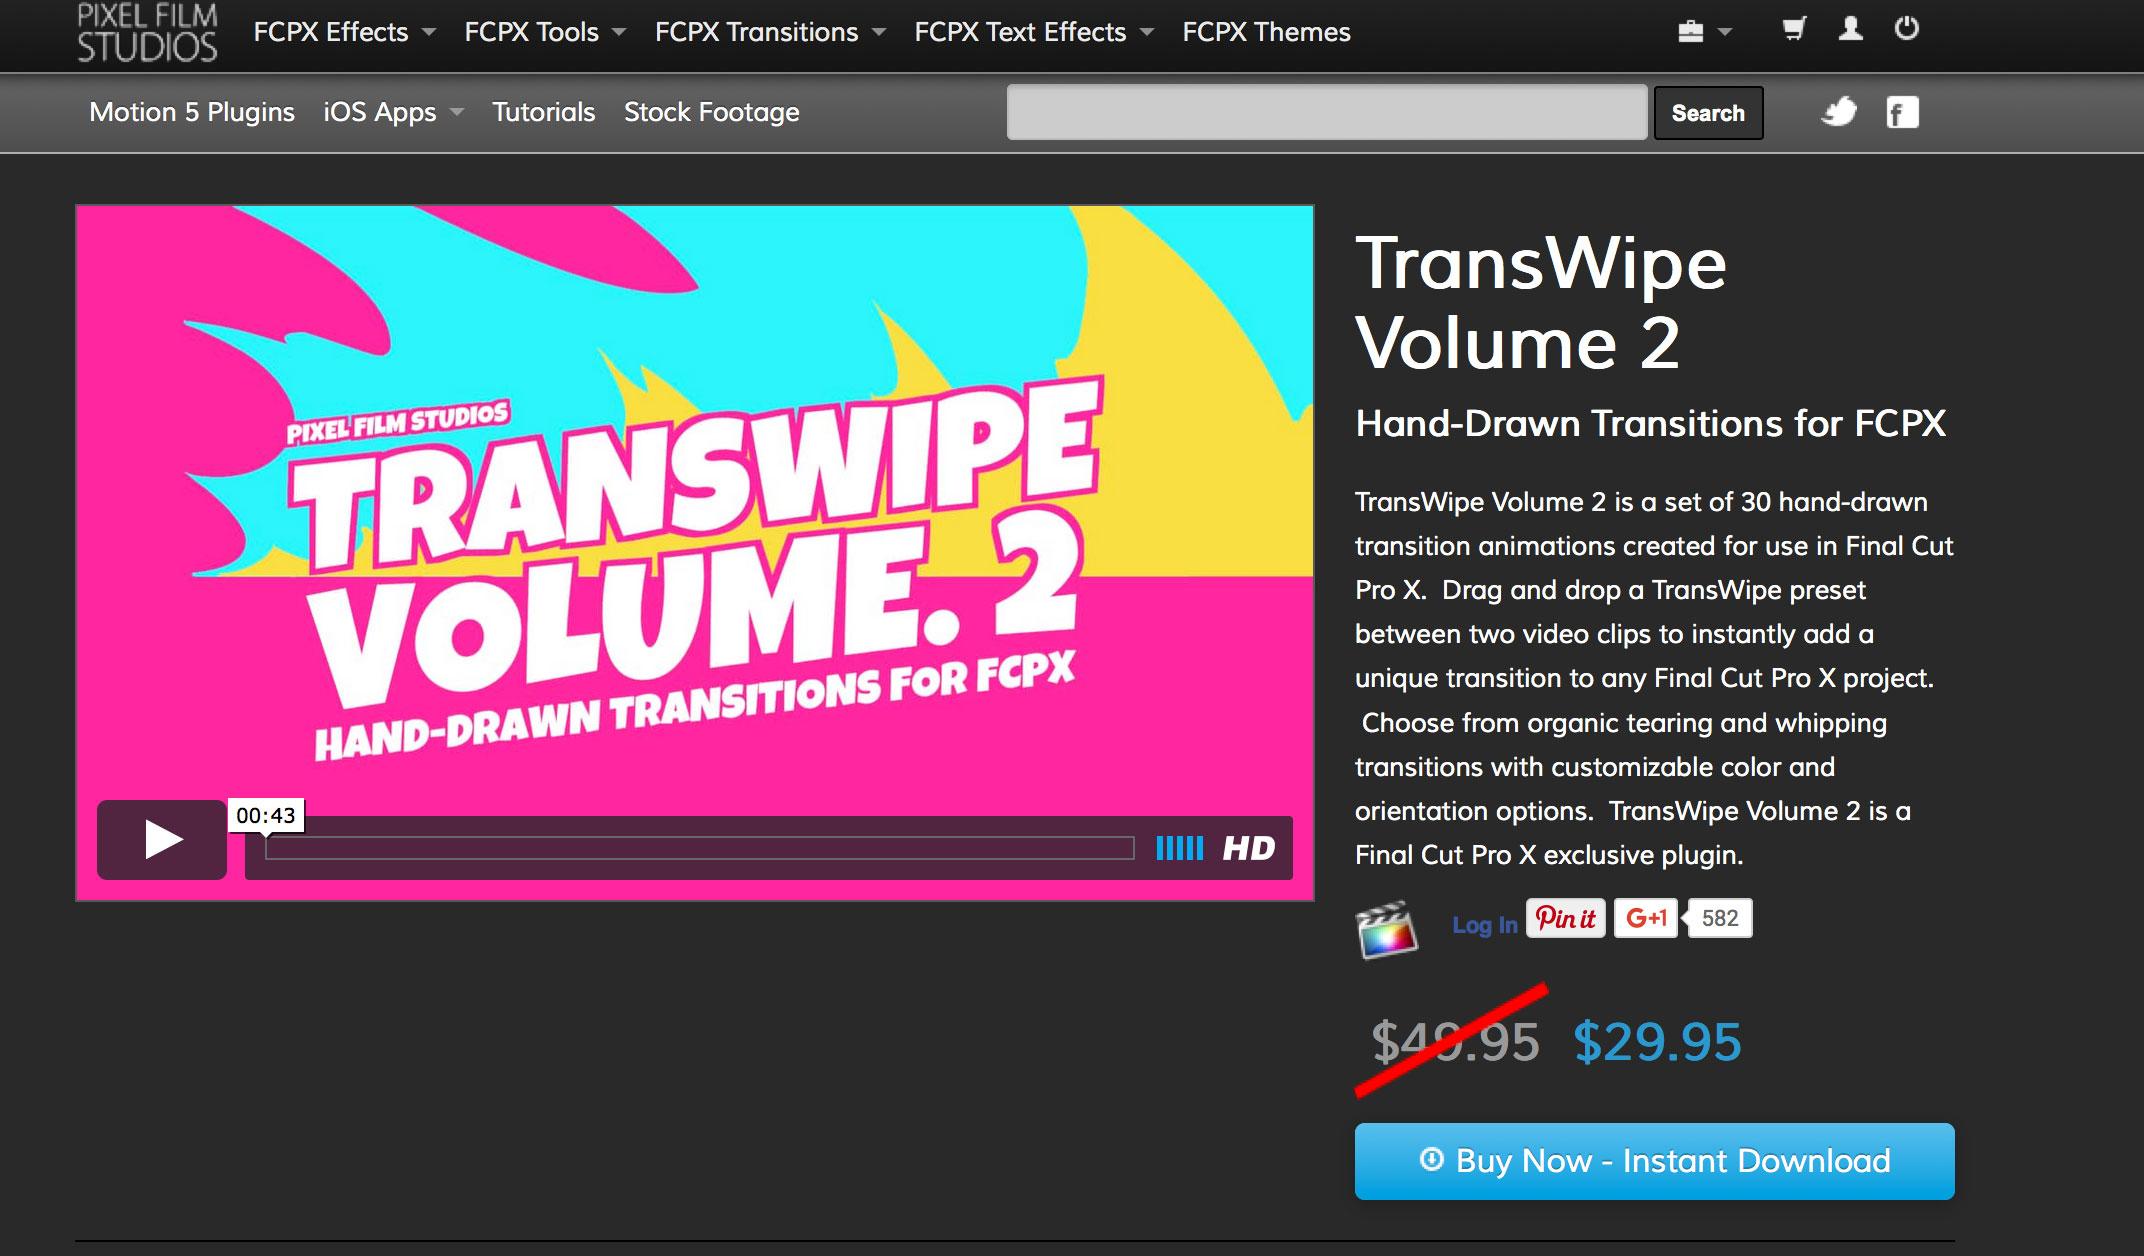 Pixel Film Studios Announced the Release of TransWipe Volume